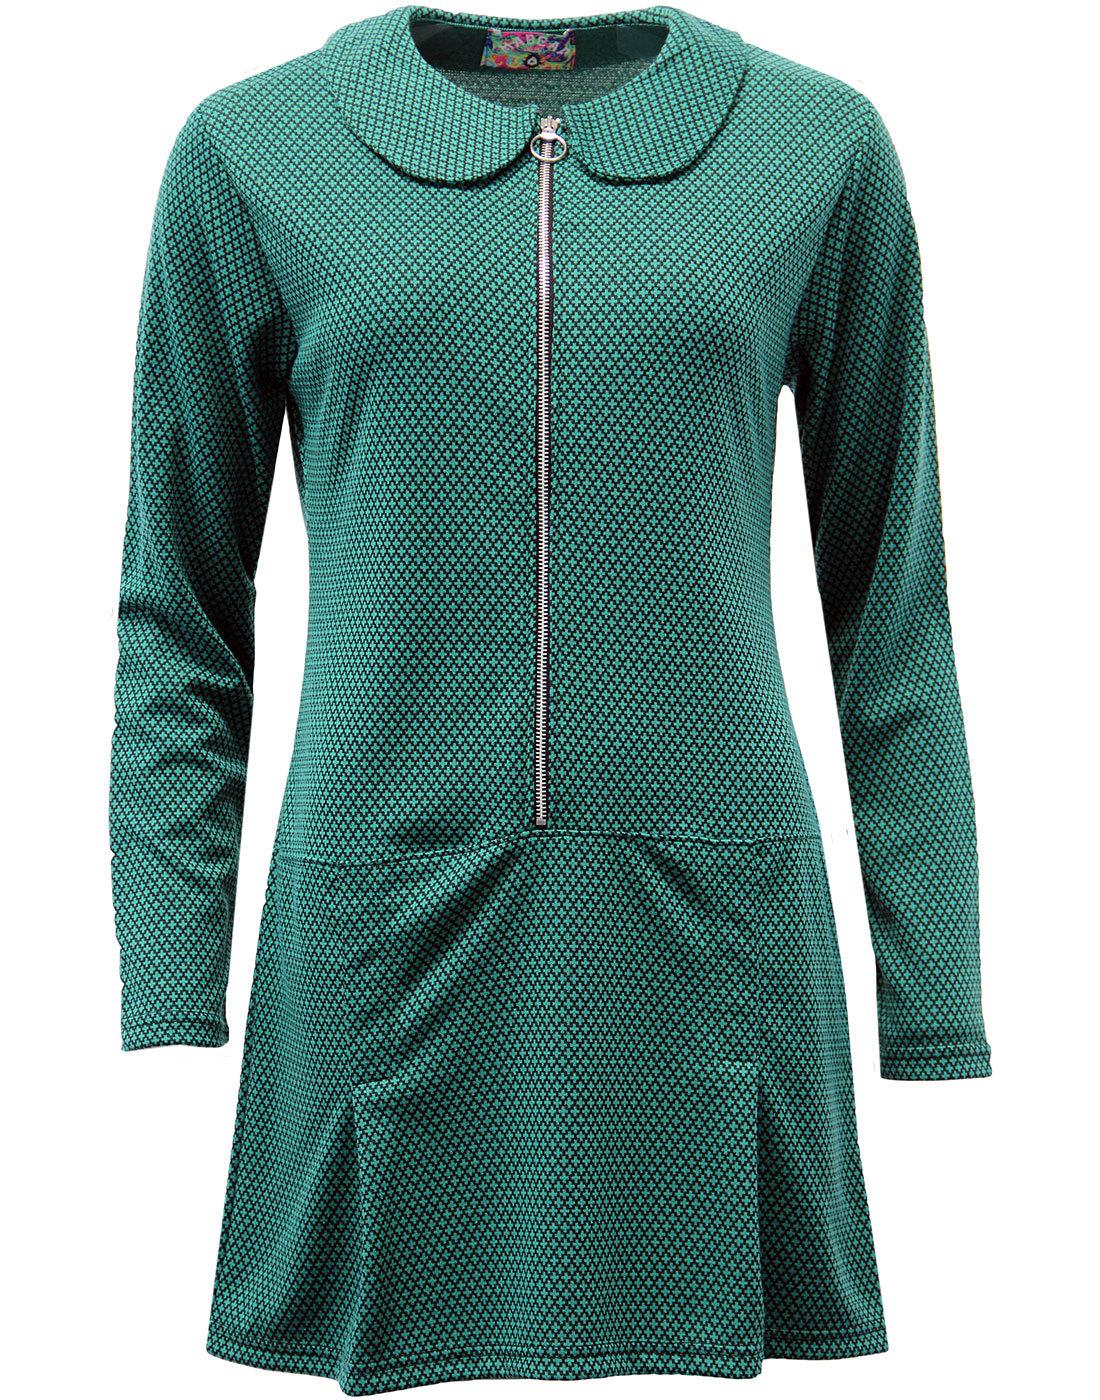 madcap england mayfair mod ring zip dress green